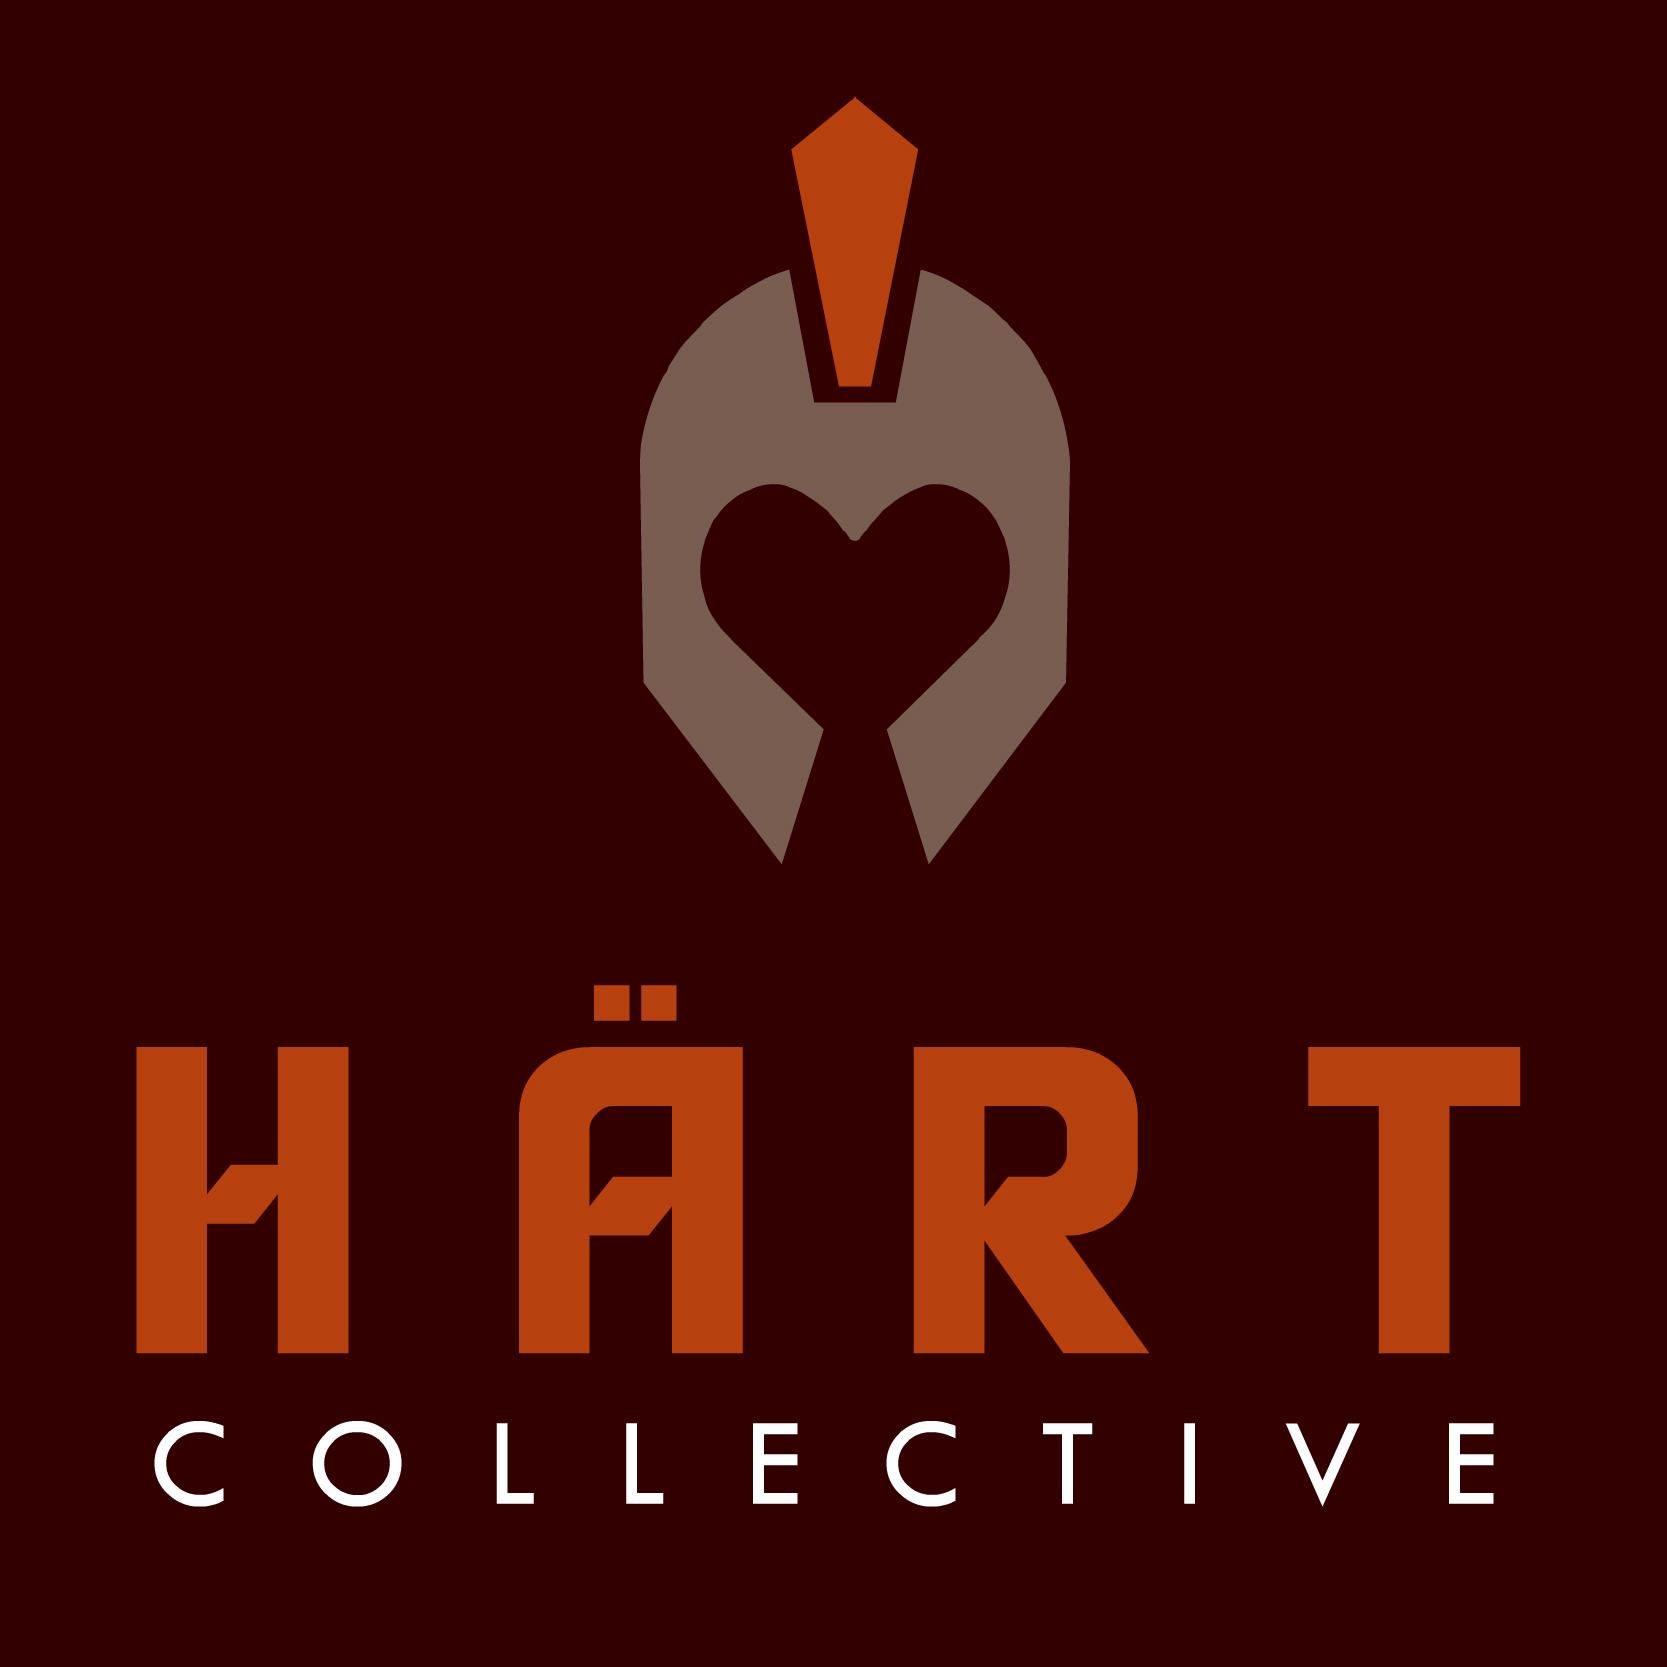 The Hart collective logo